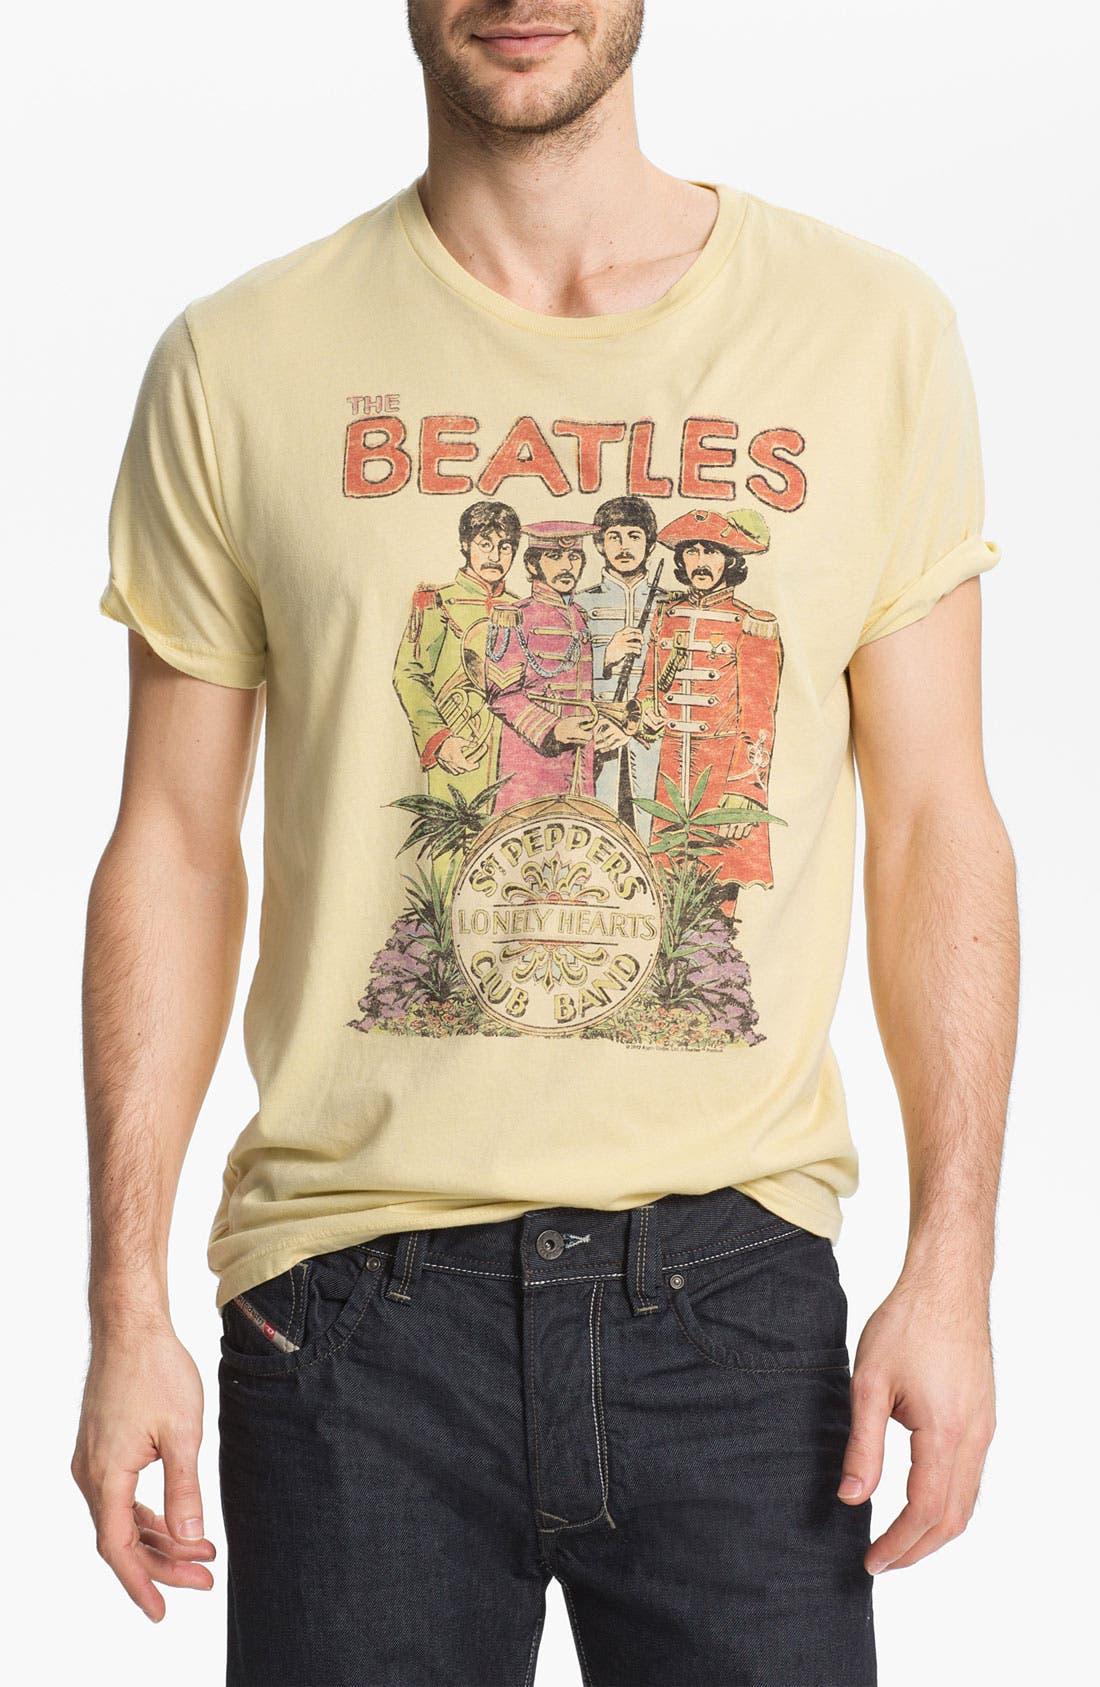 Alternate Image 1 Selected - Junk Food 'The Beatles' Graphic T-shirt